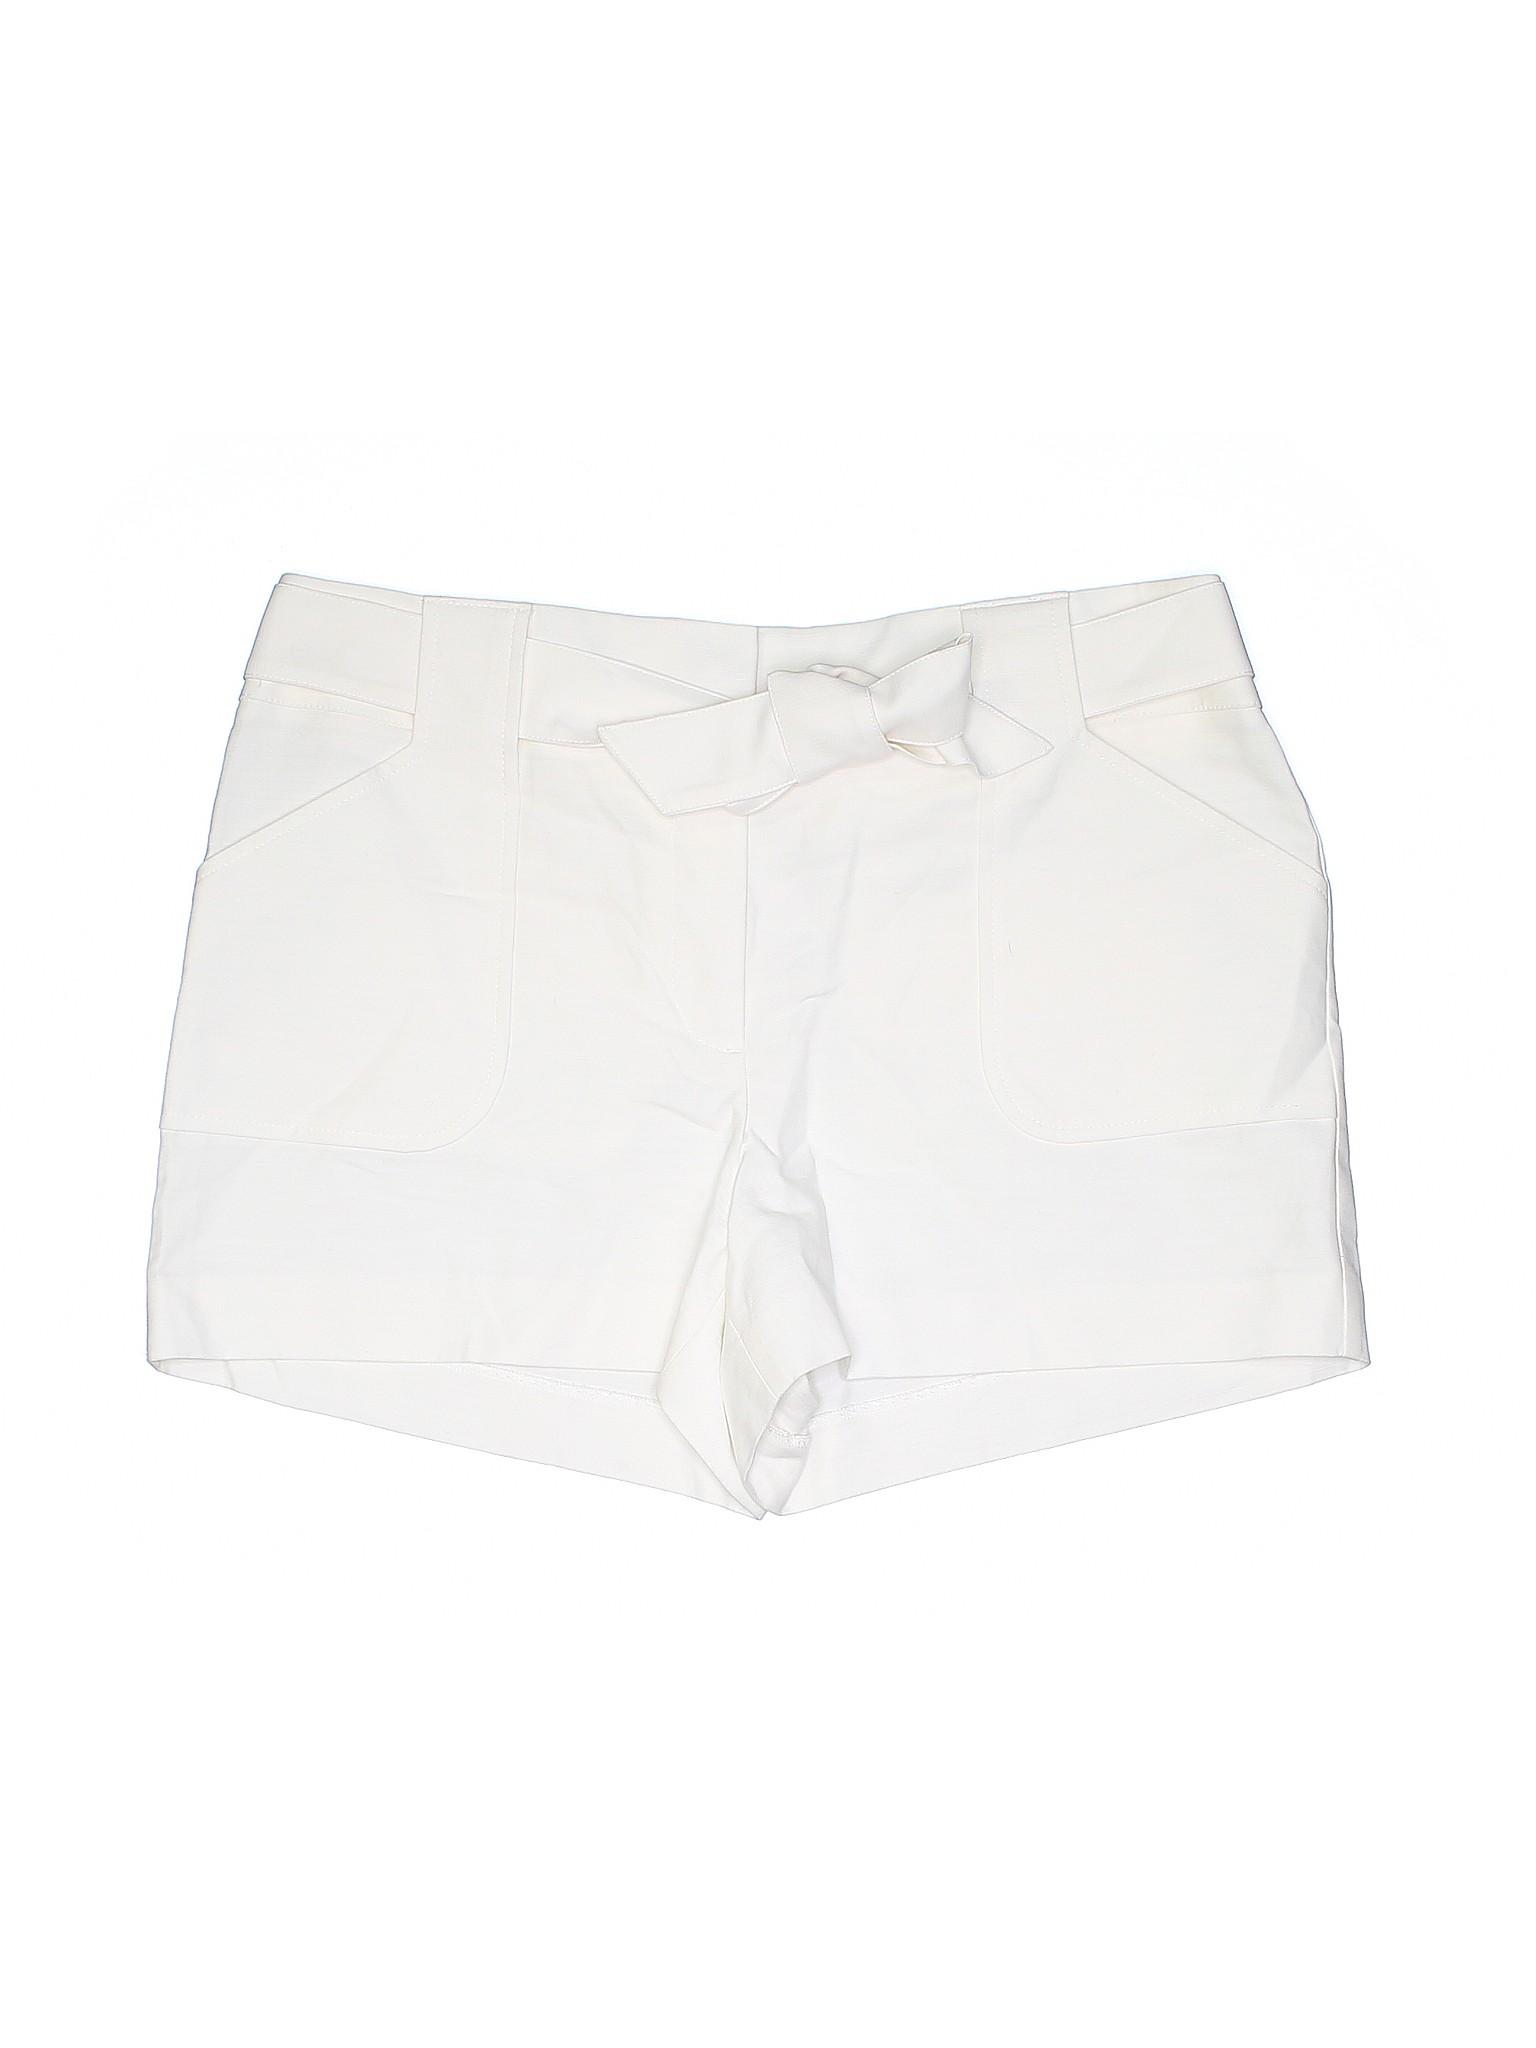 Shorts LOFT Taylor Boutique Dressy Ann wHEIPx44q